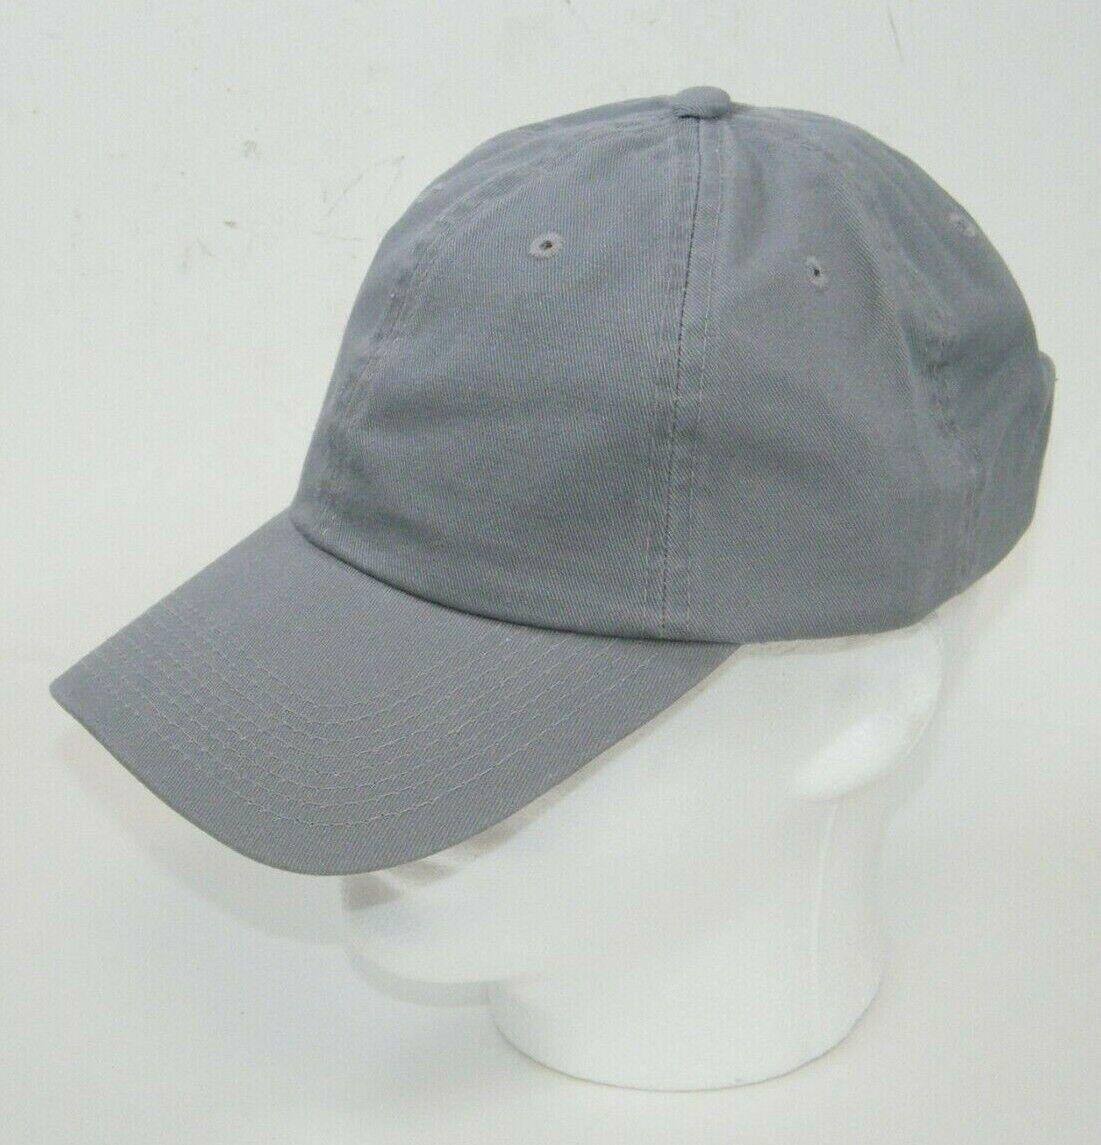 (5) FAHRENHEIT HEADWEAR 508 CAPS / HATS GARMENT WASHED GRAY BUCKLE BACK